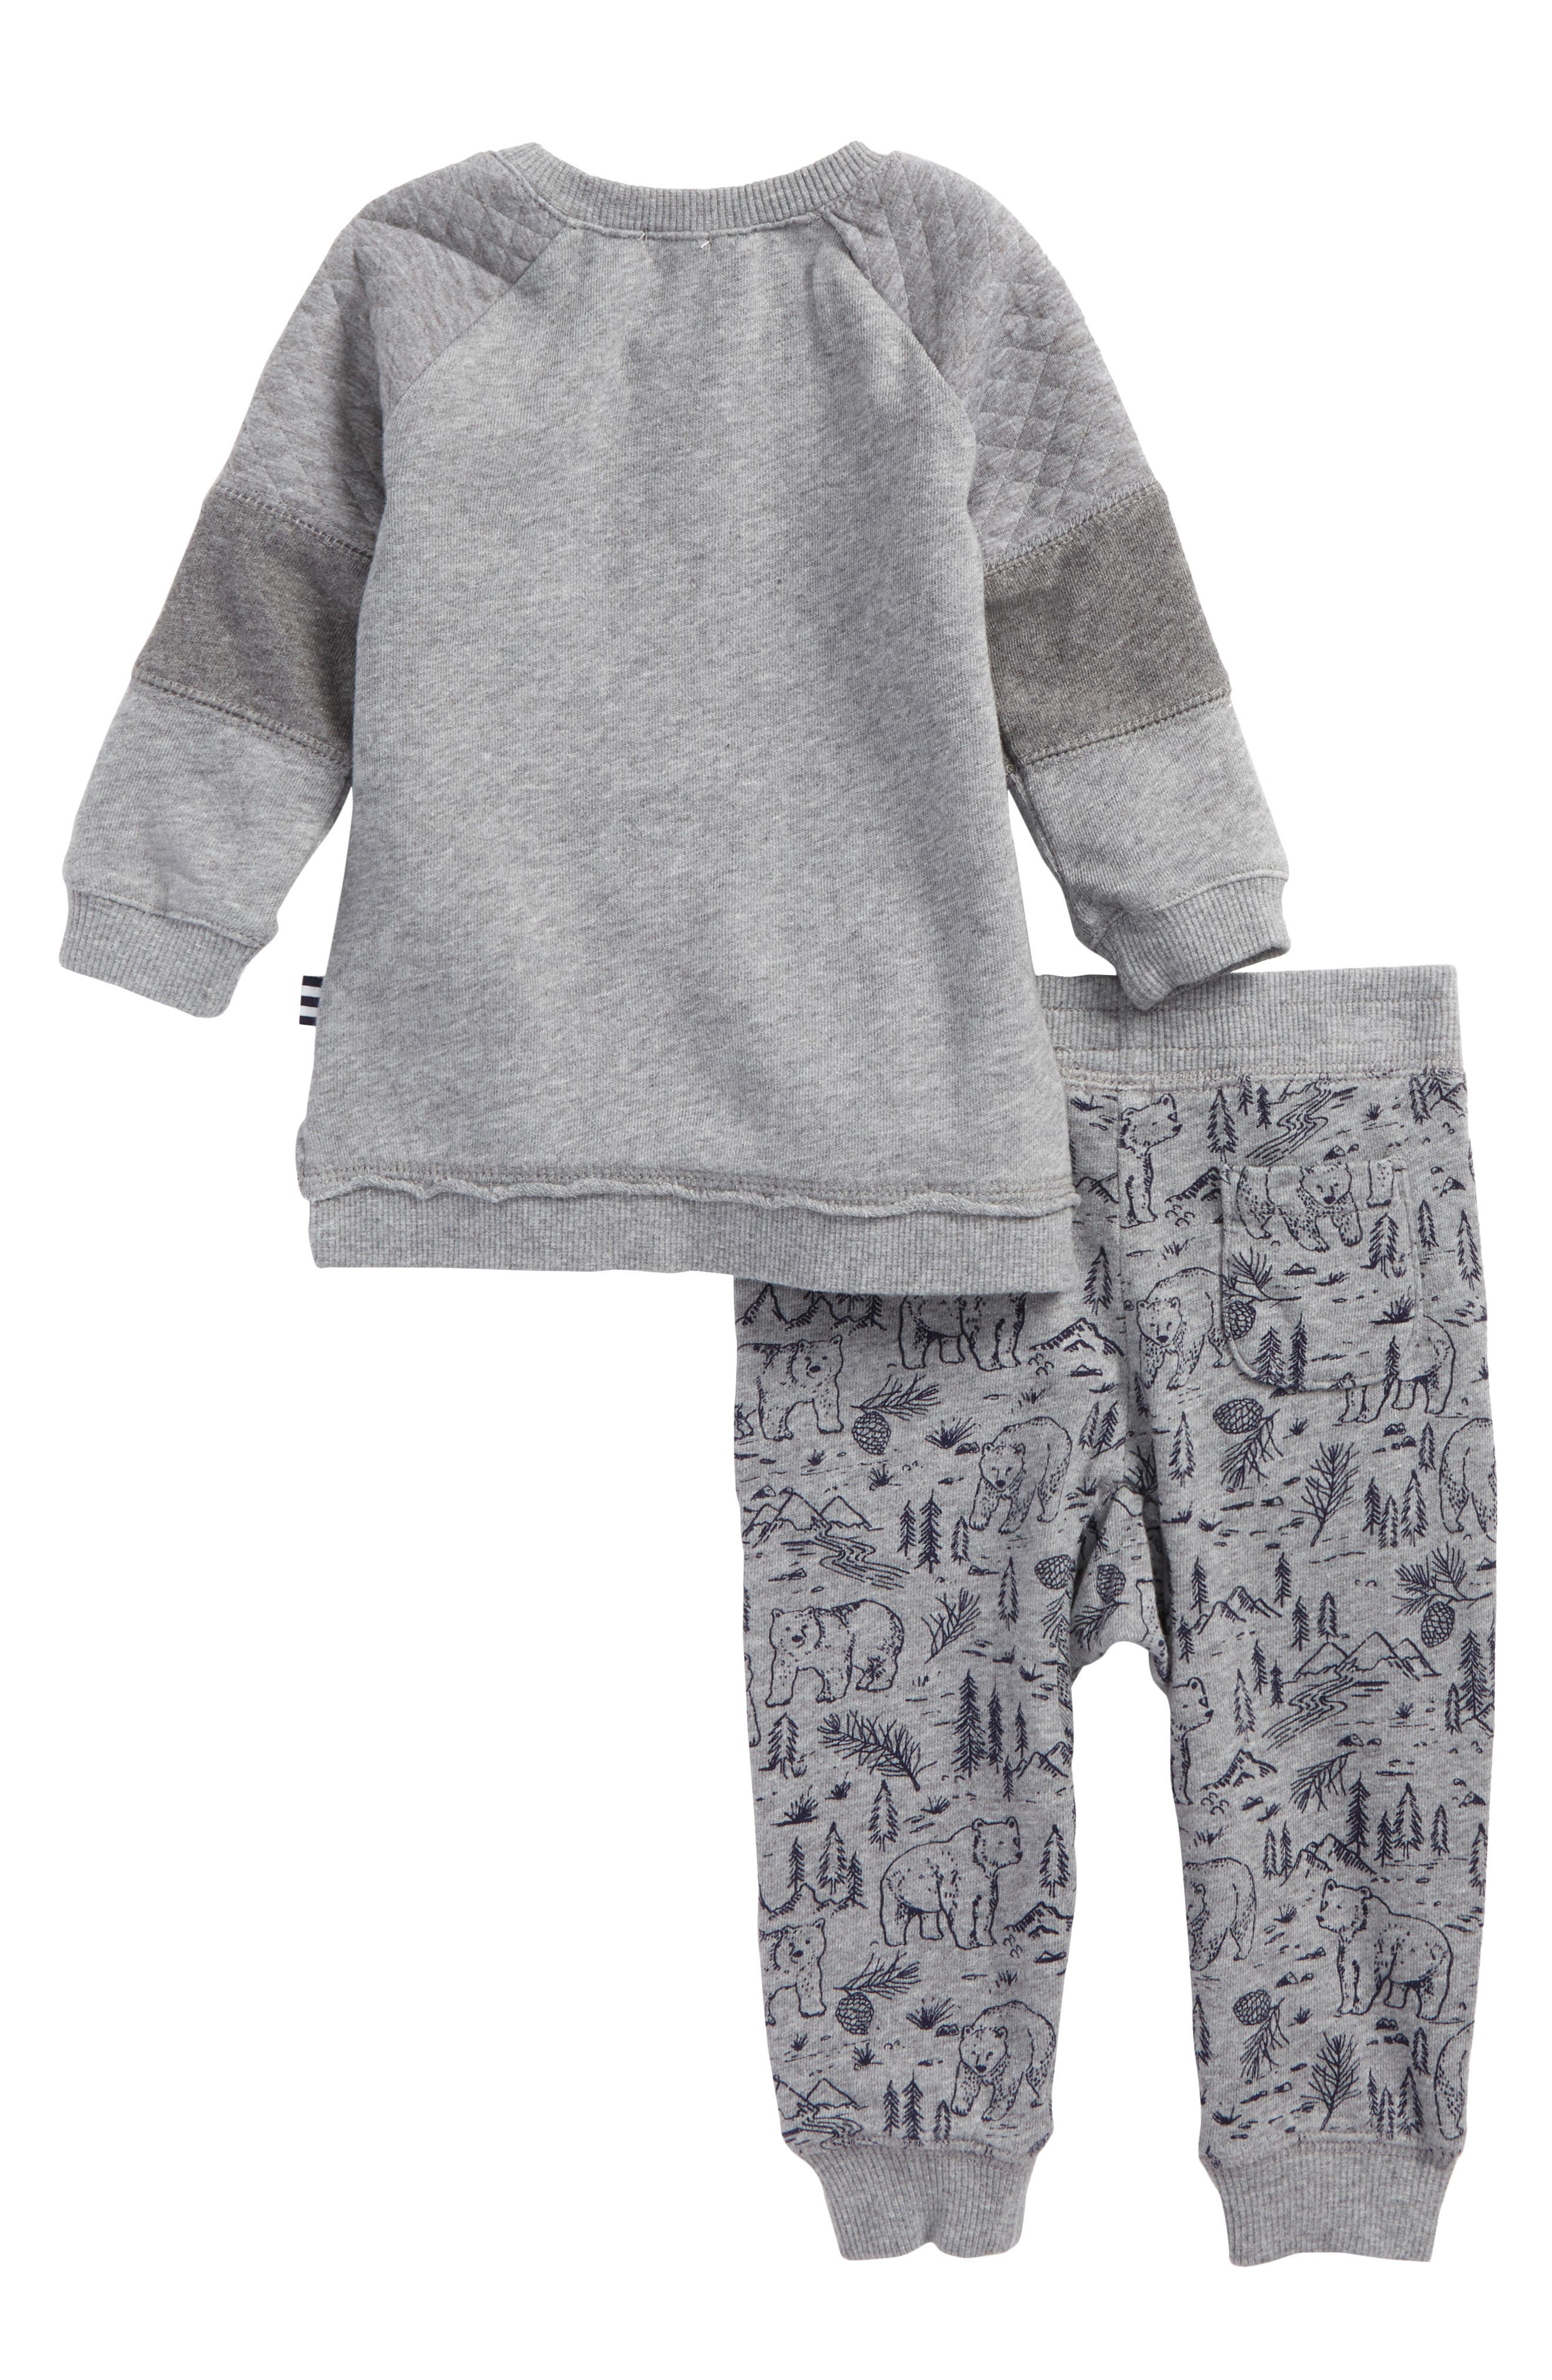 Alternate Image 2  - Splendid Sweatshirt & Sweatpants Set (Baby Boys)